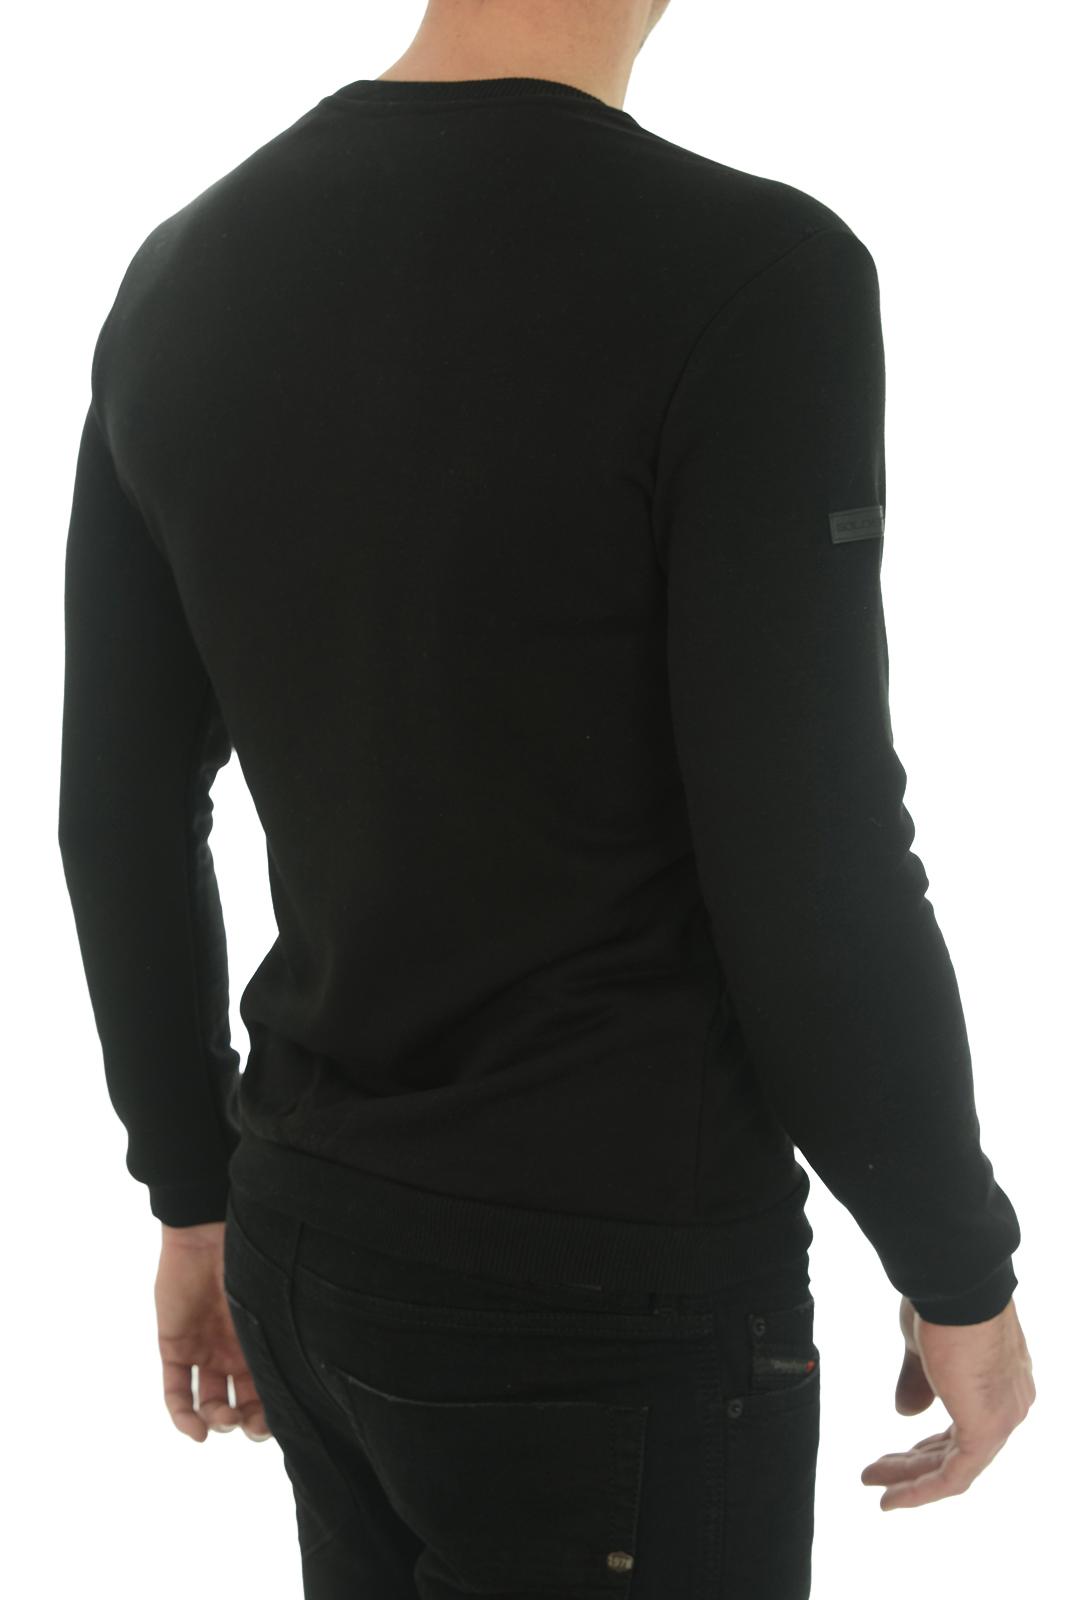 Sweatshirts  Goldenim paris 1870 NOIR